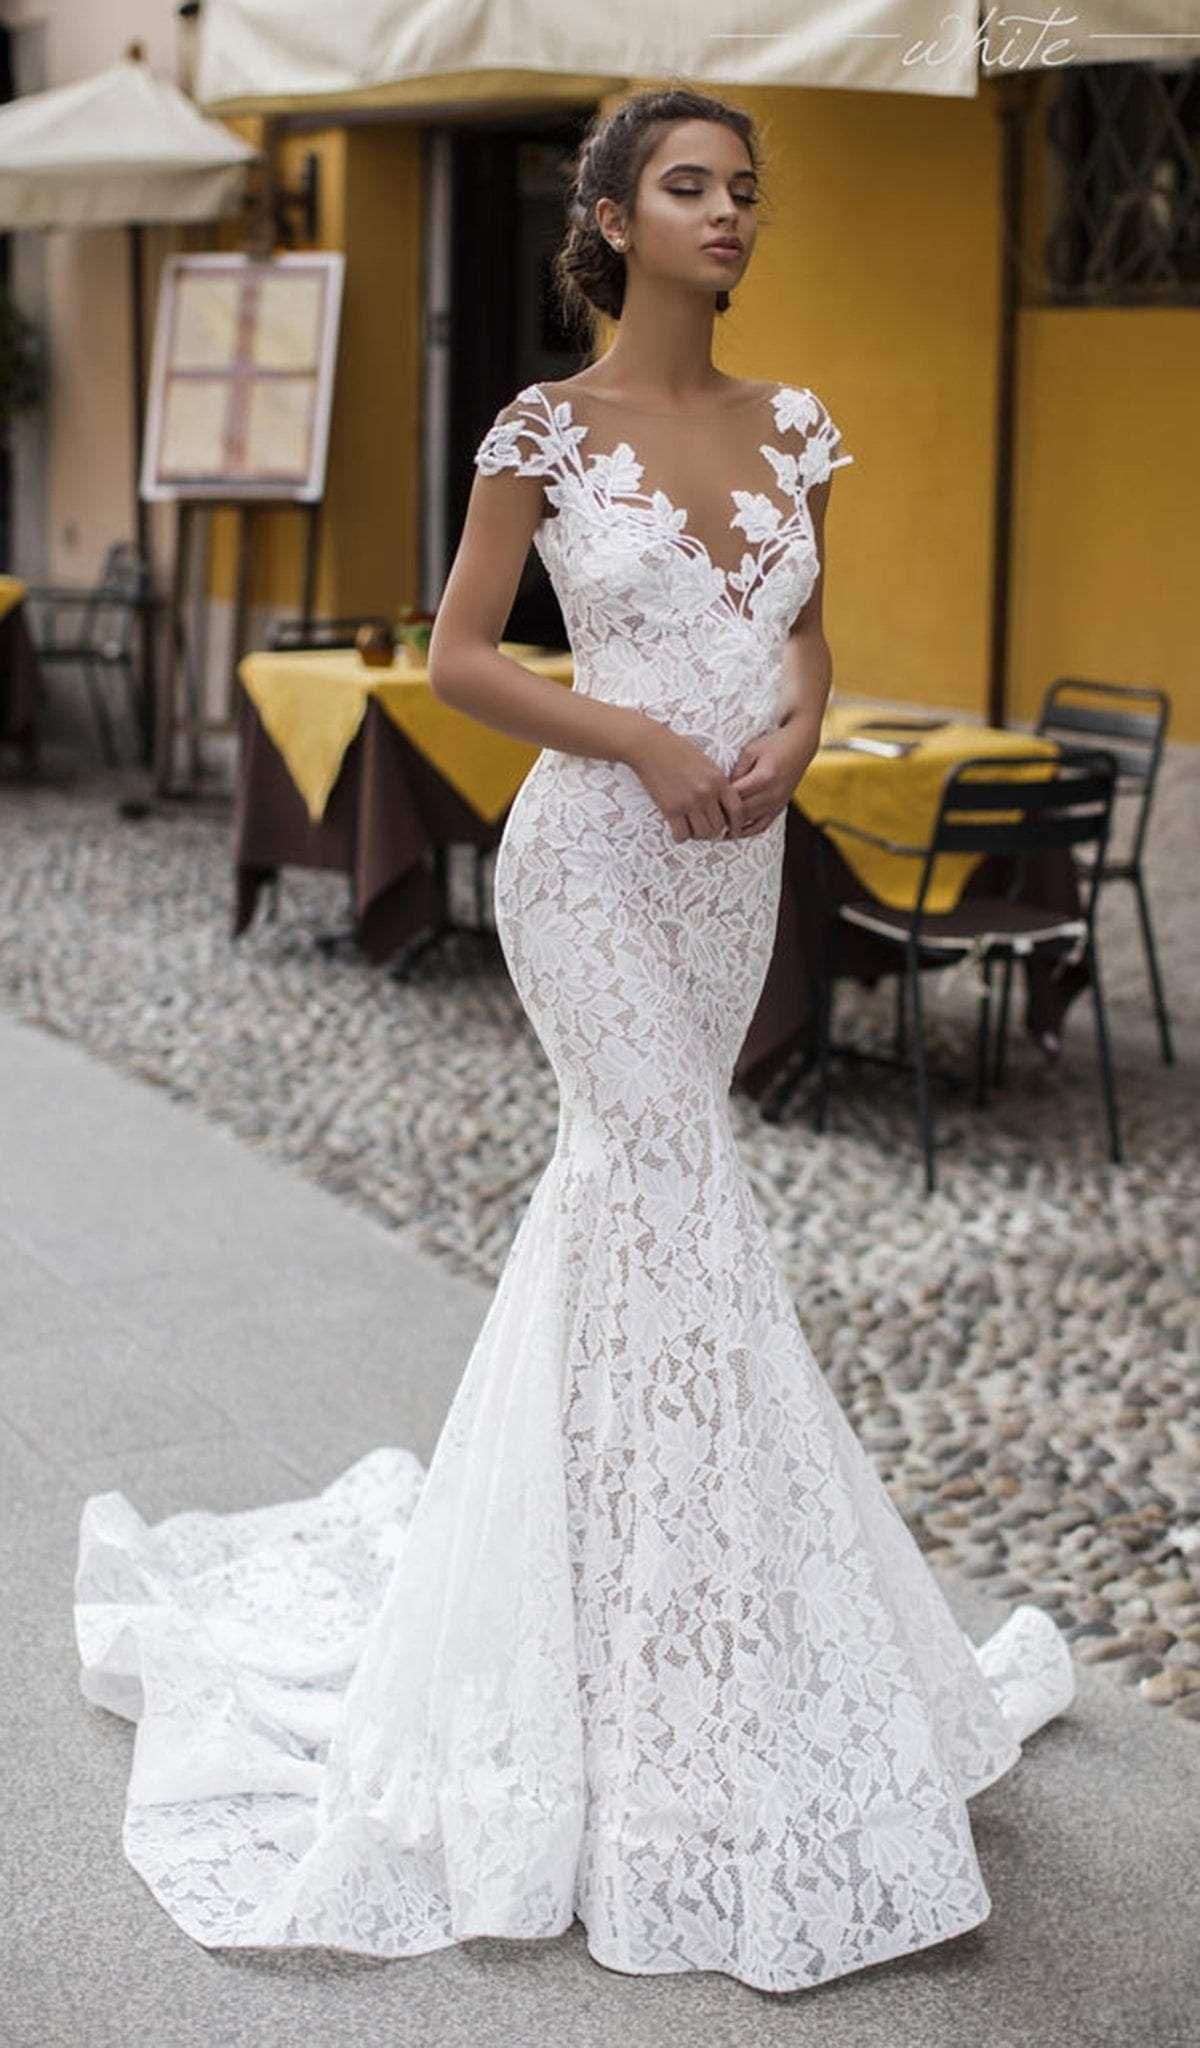 Tarik Ediz 93626 Lace Illusion Neck Mermaid Dress With Train Lace Mermaid Wedding Dress Gorgeous Wedding Dress Wedding Dresses [ 2048 x 1200 Pixel ]